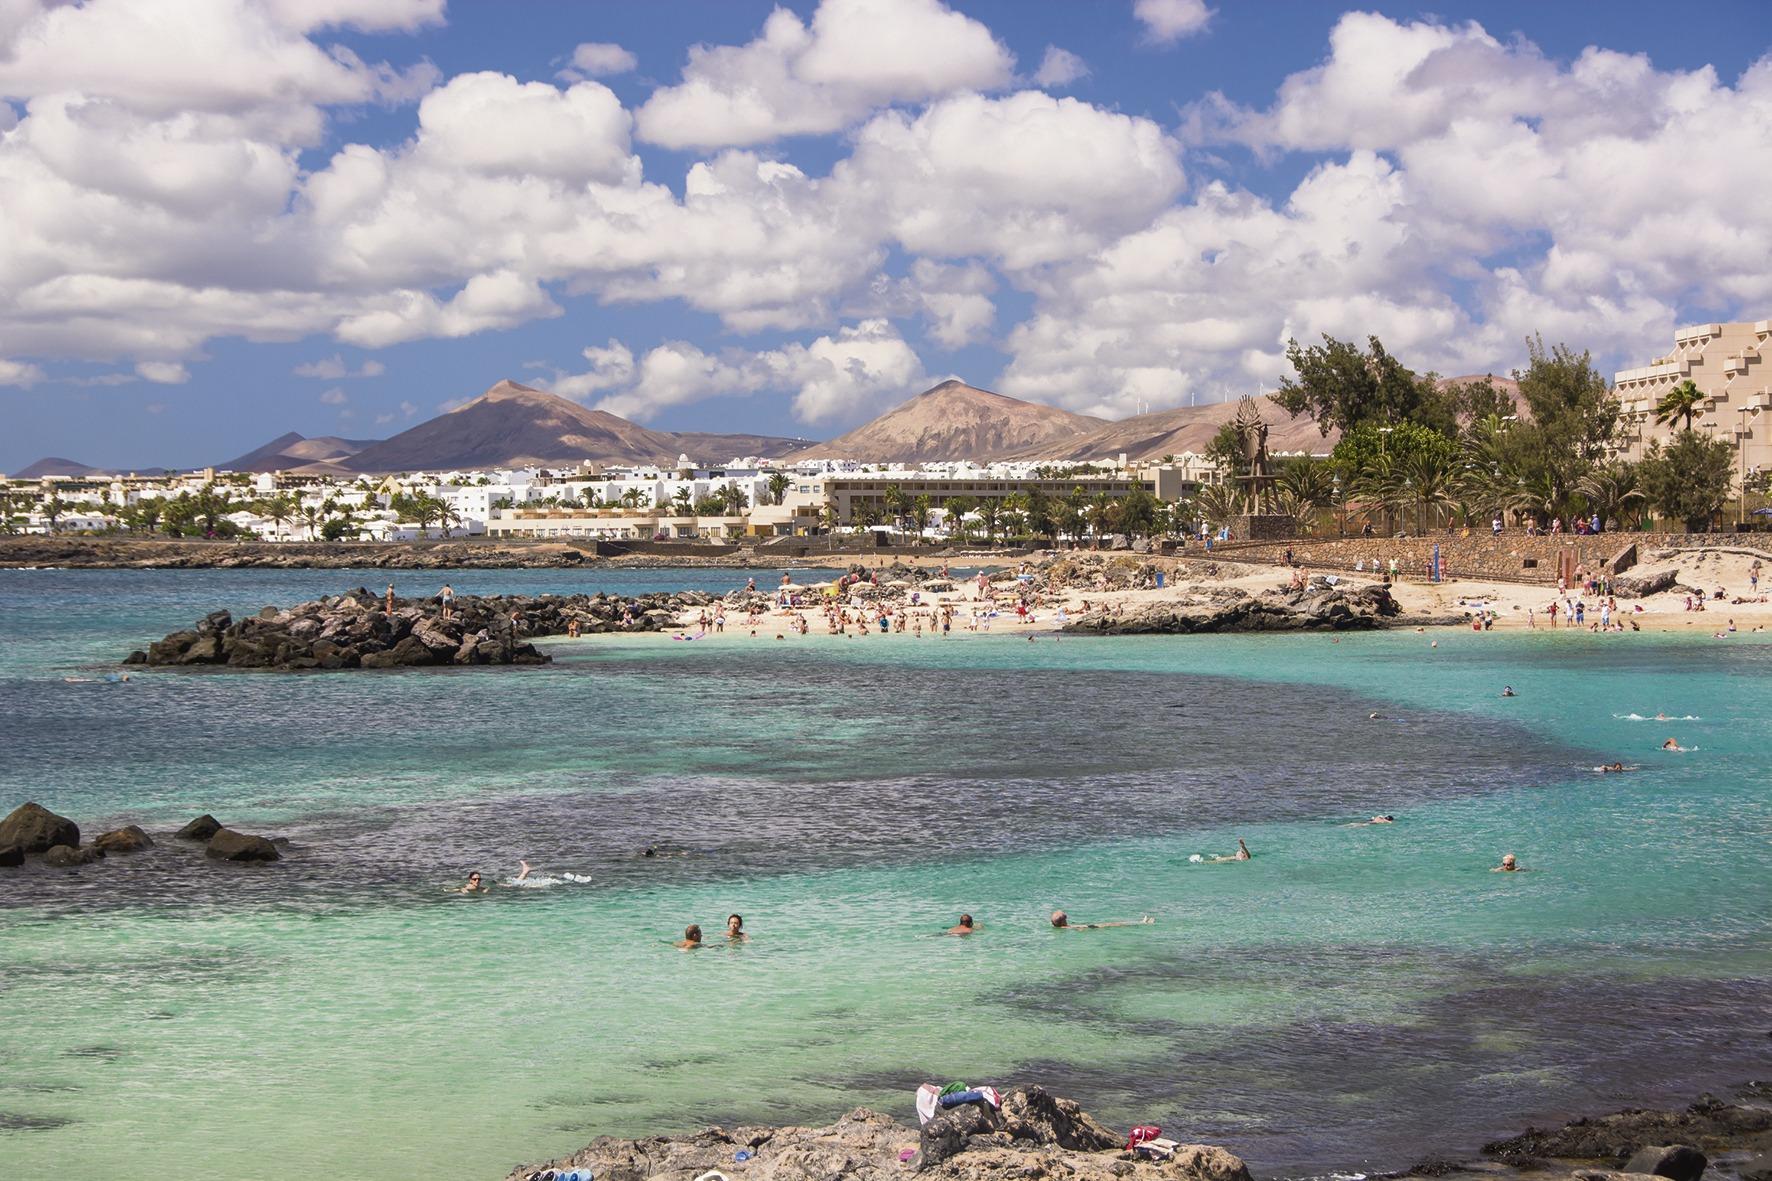 Playa del Jablillo Costa Teguise CANARY ISLANDS